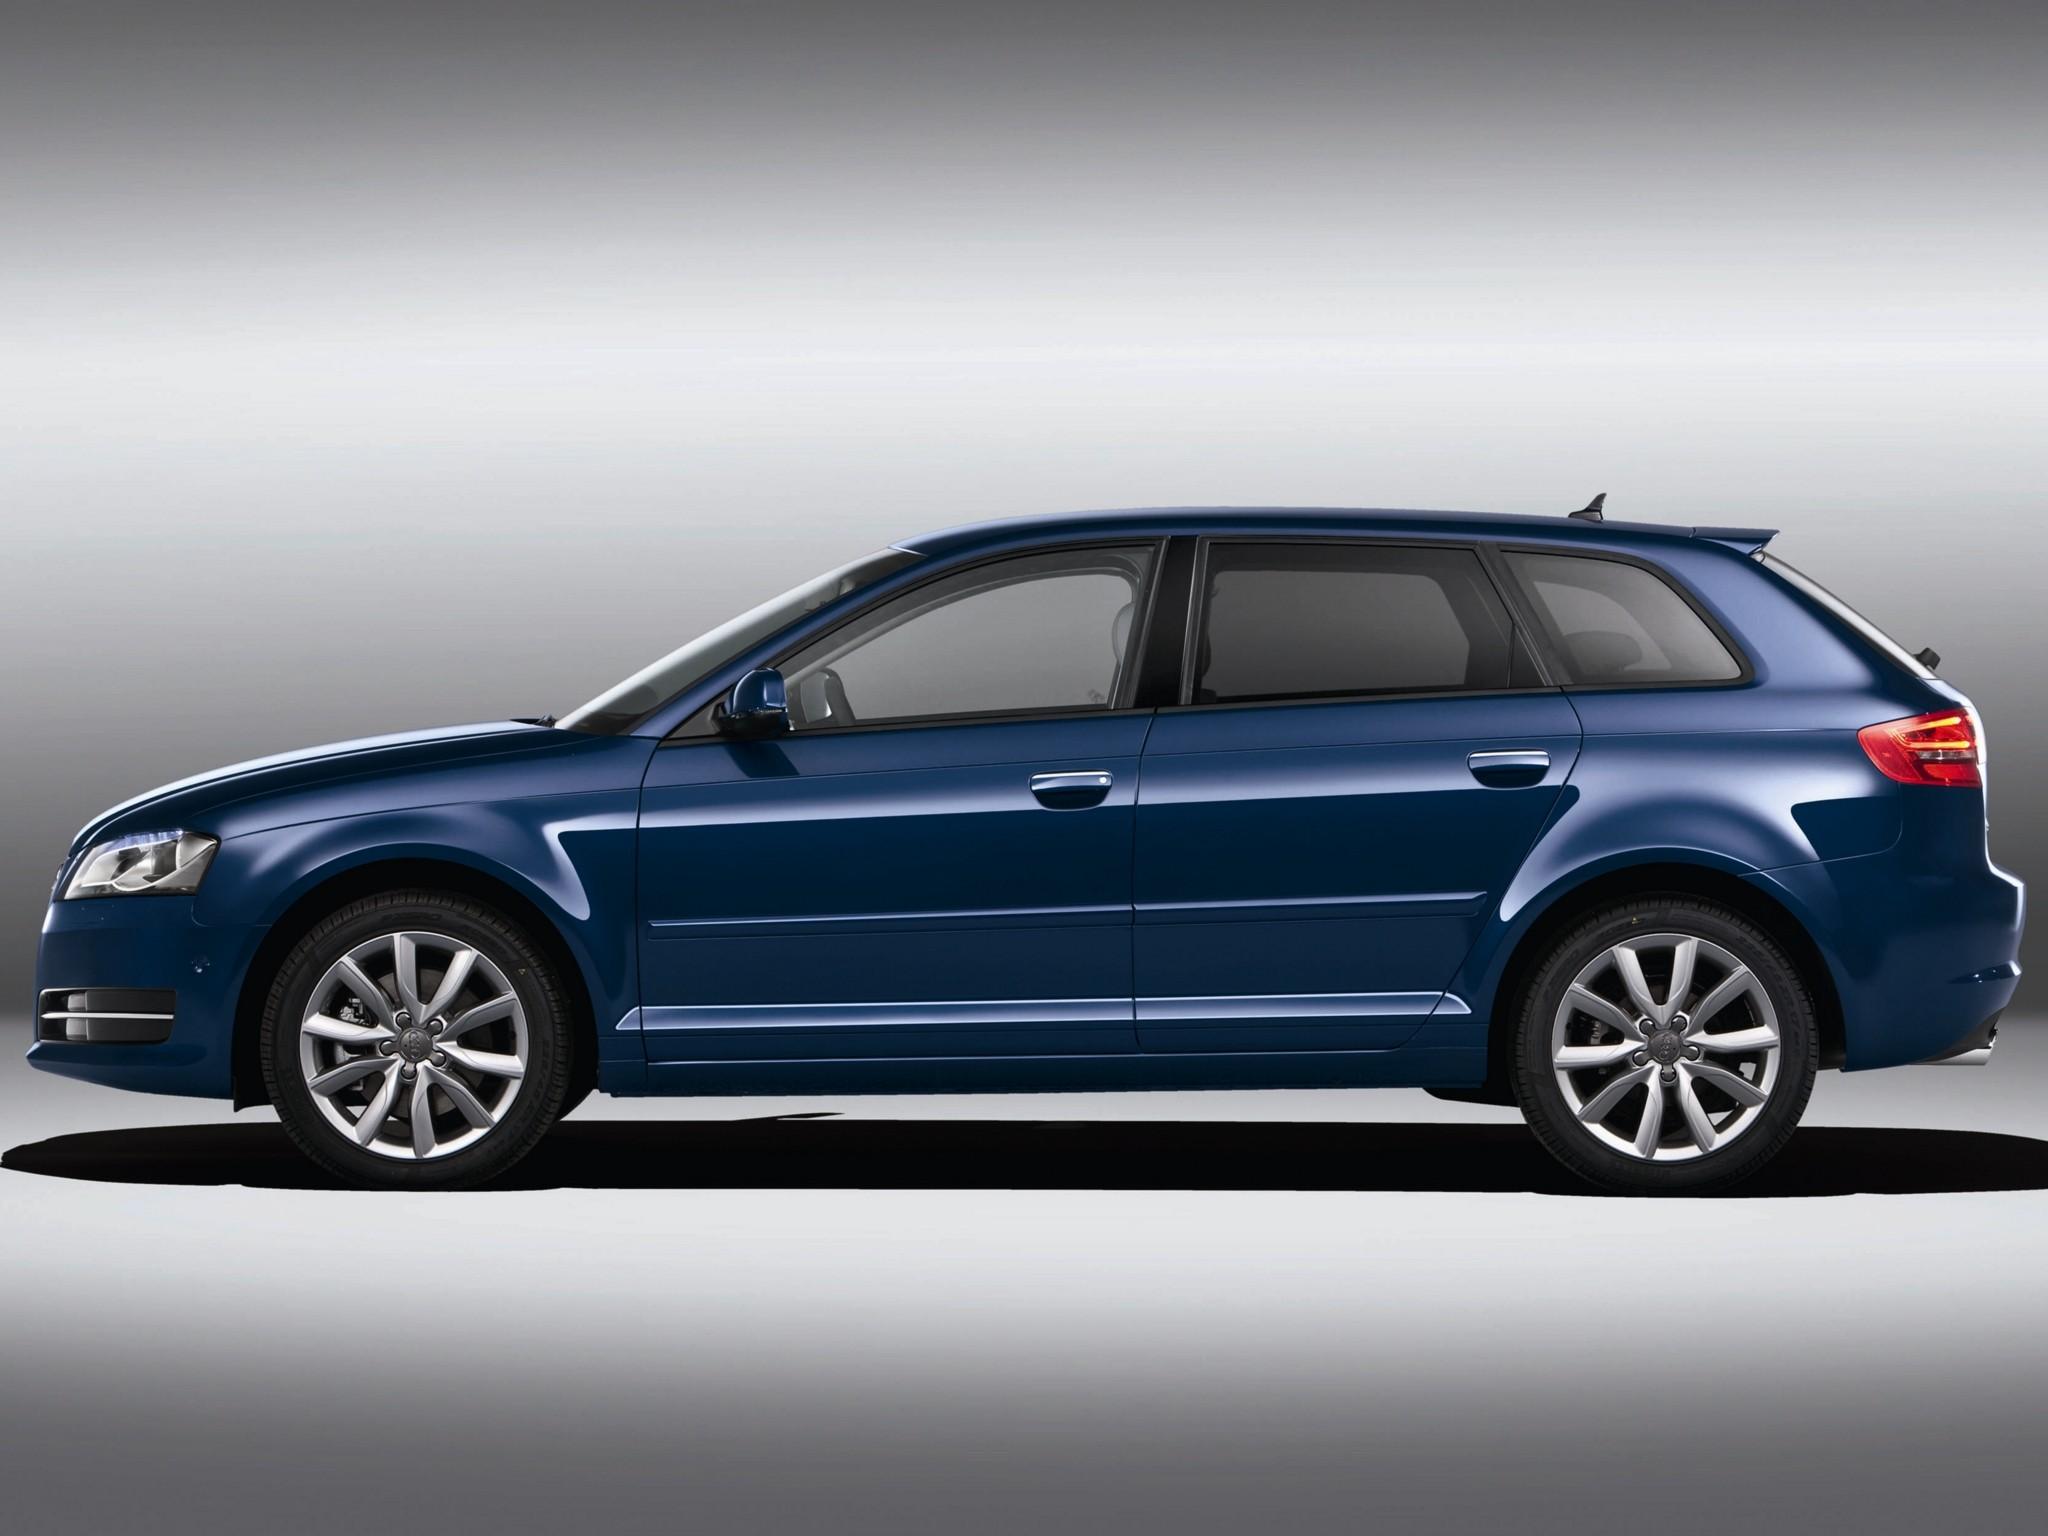 AUDI A3 Sportback - 2008, 2009, 2010, 2011 - autoevolution